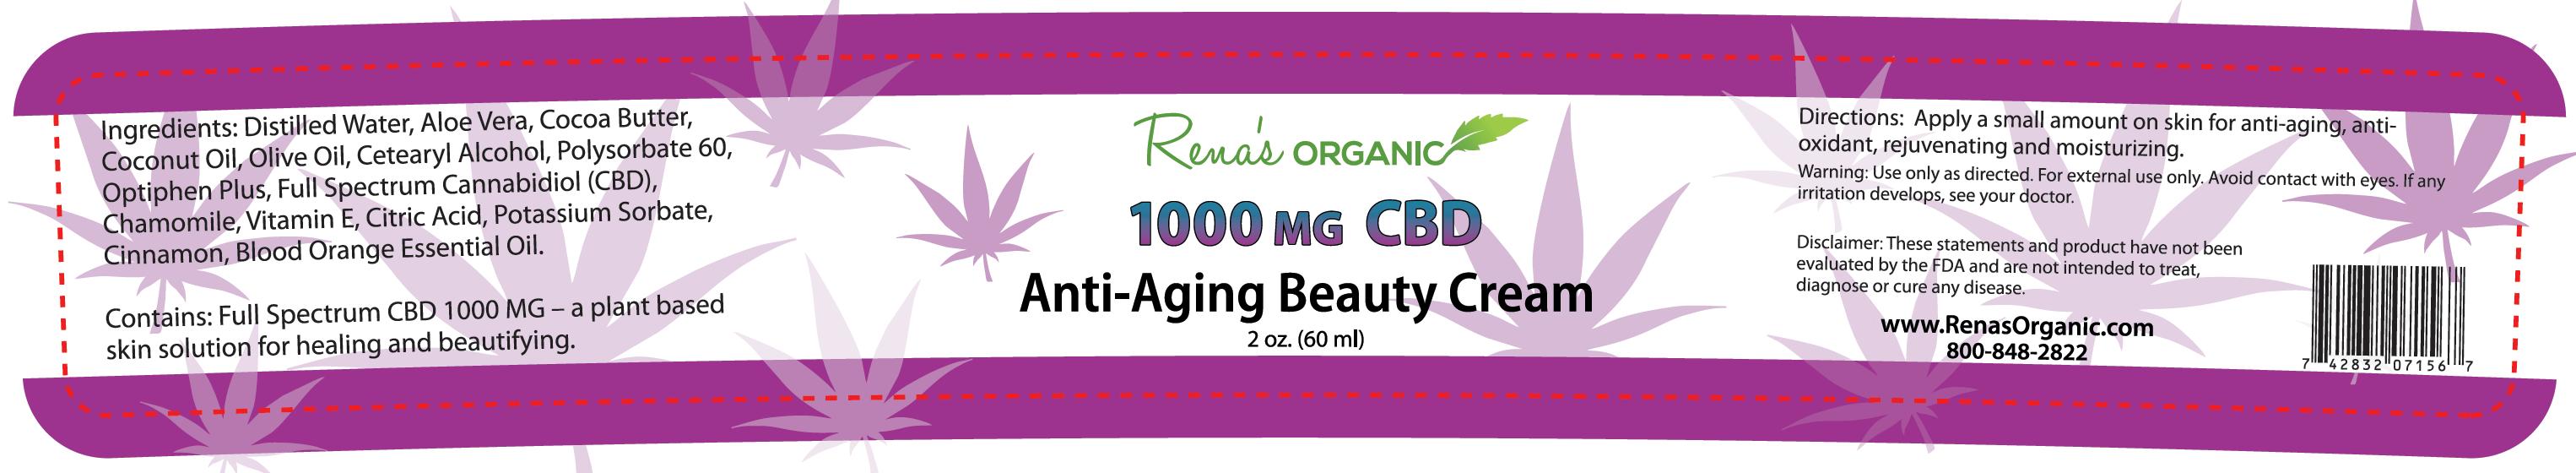 1000 mg CBD anti aging cream